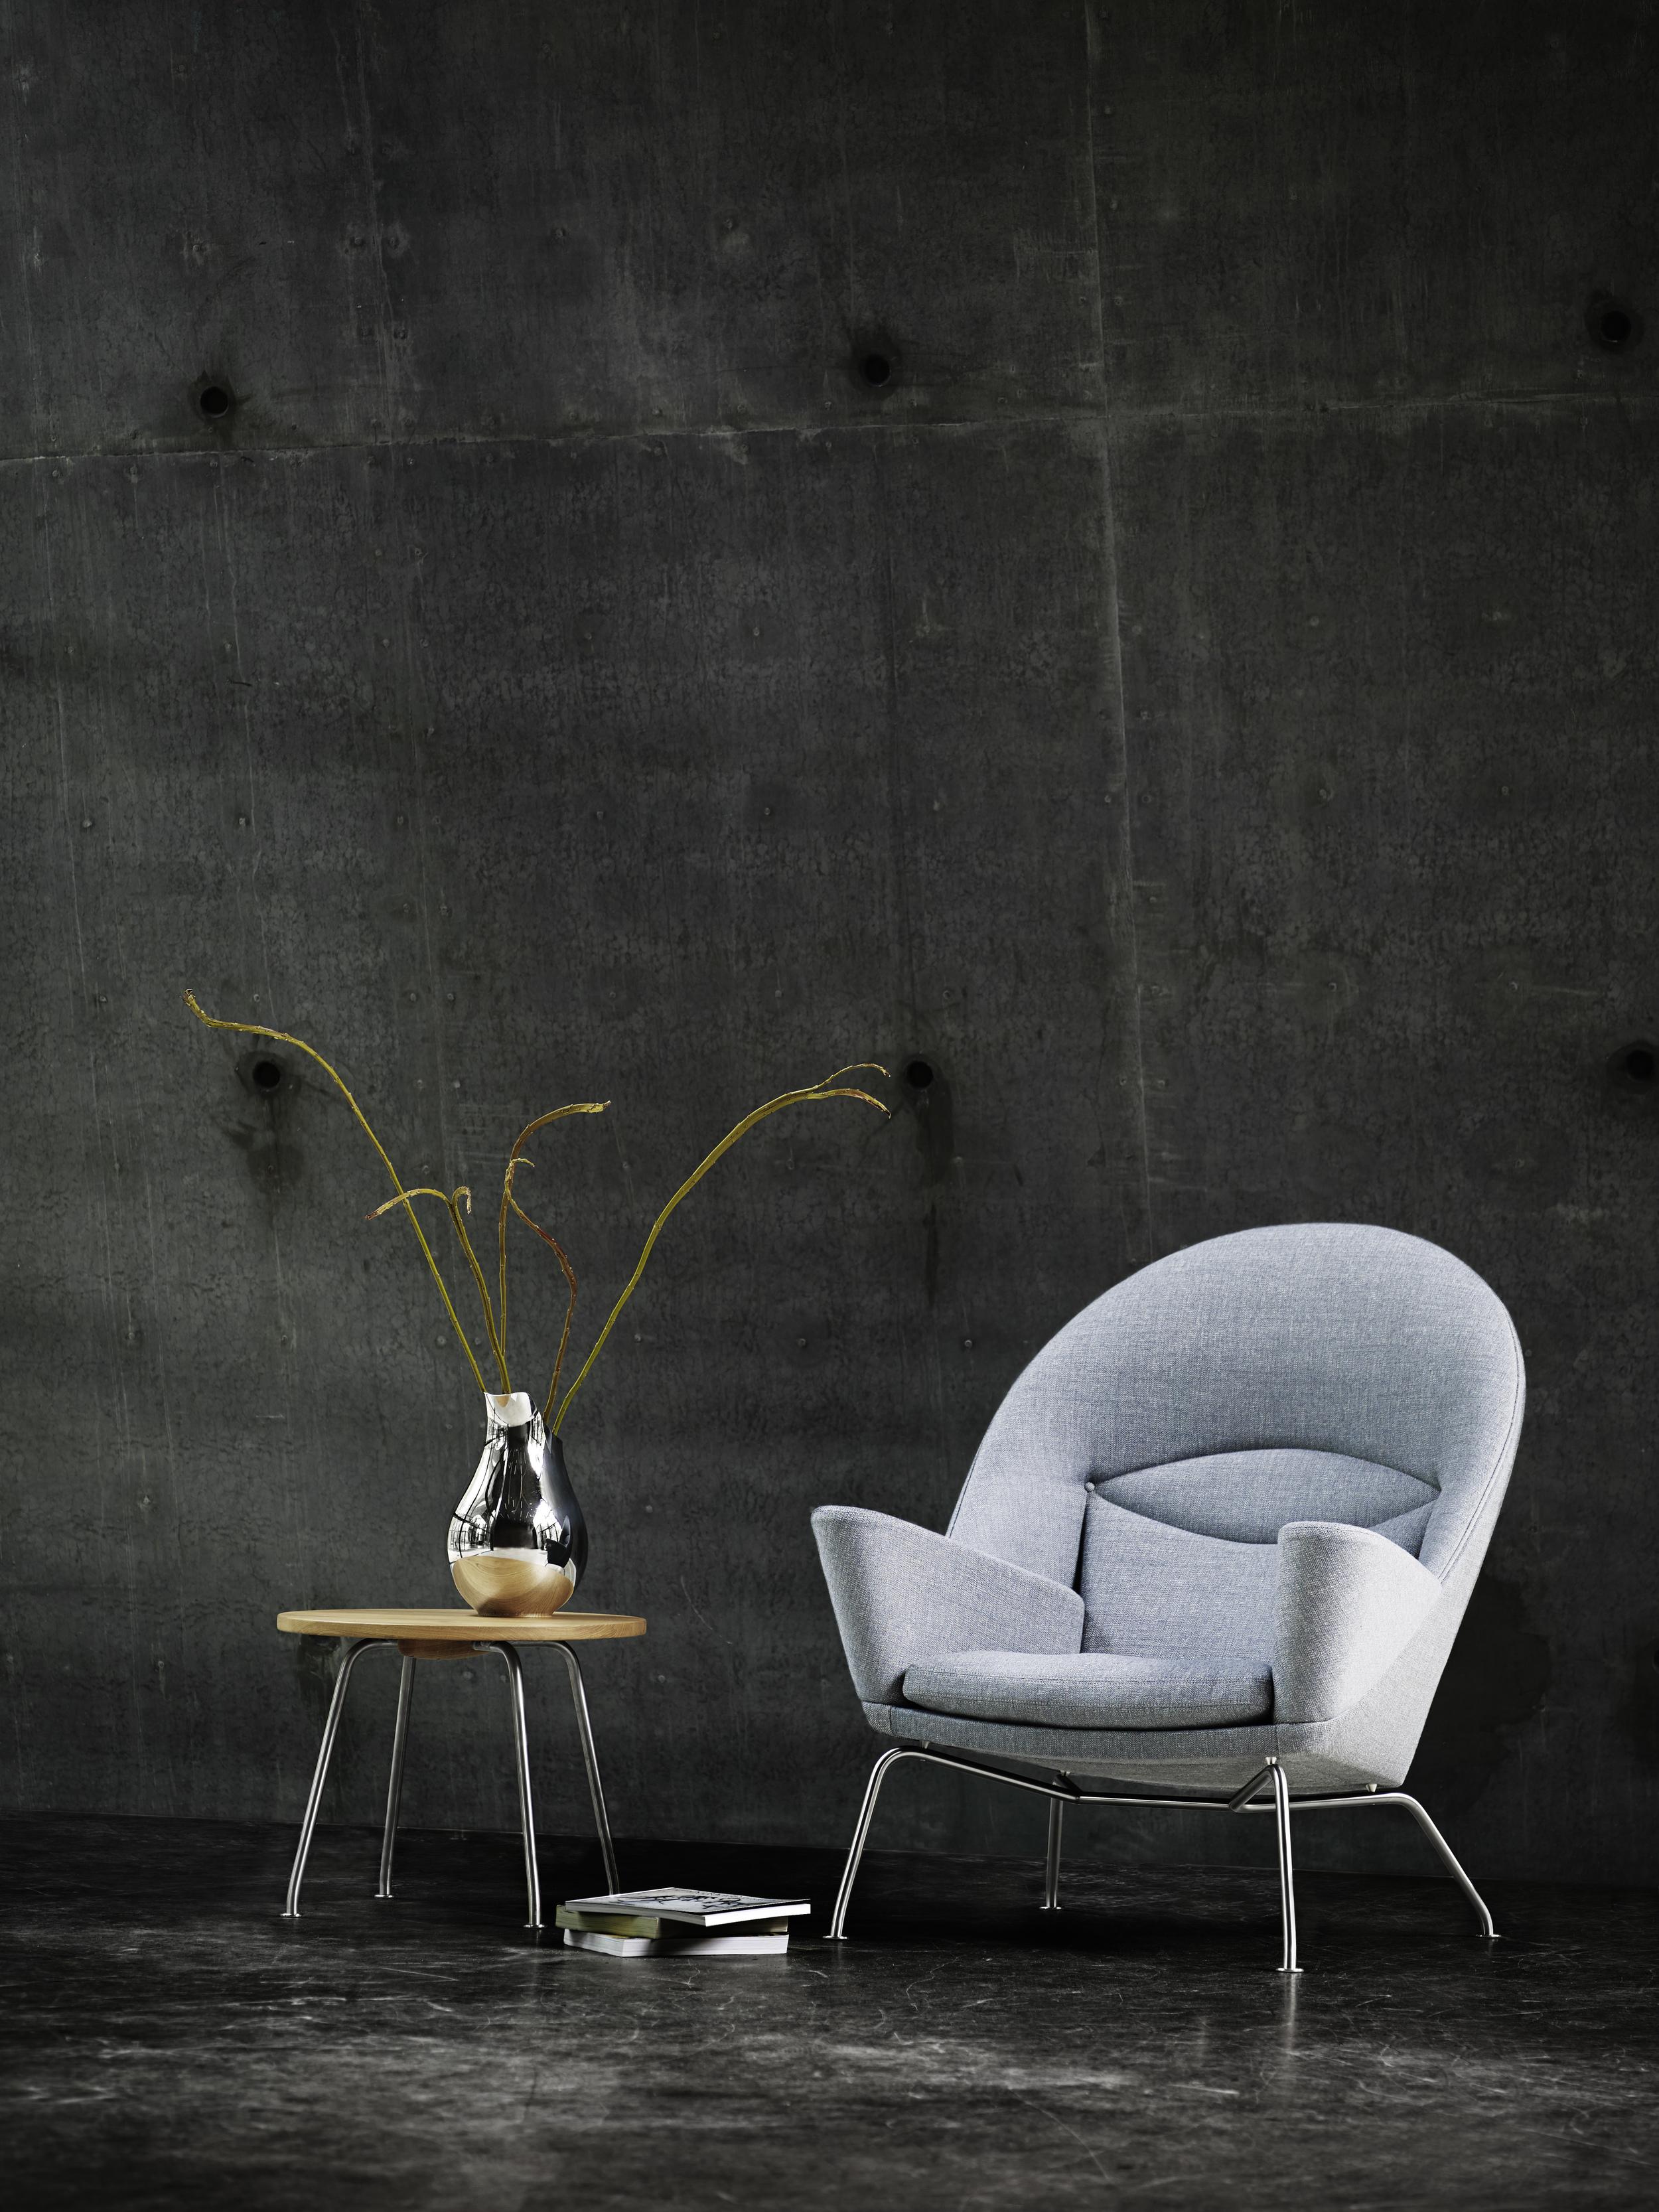 Oculus CH468 Lounge Chair by Hans Wegner for Carl Hansen